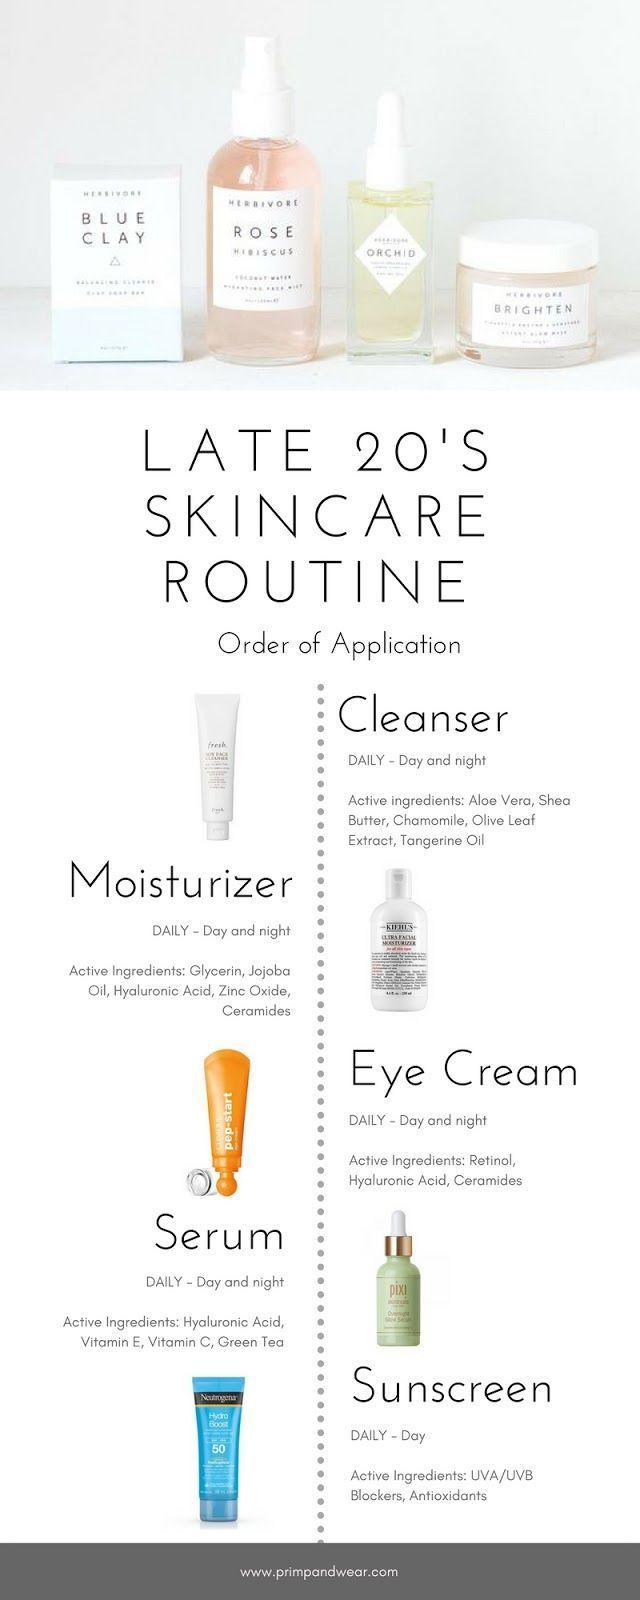 Late 20s Skincare Routine Skin Care Skin Care Routine Order Skin Care Routine